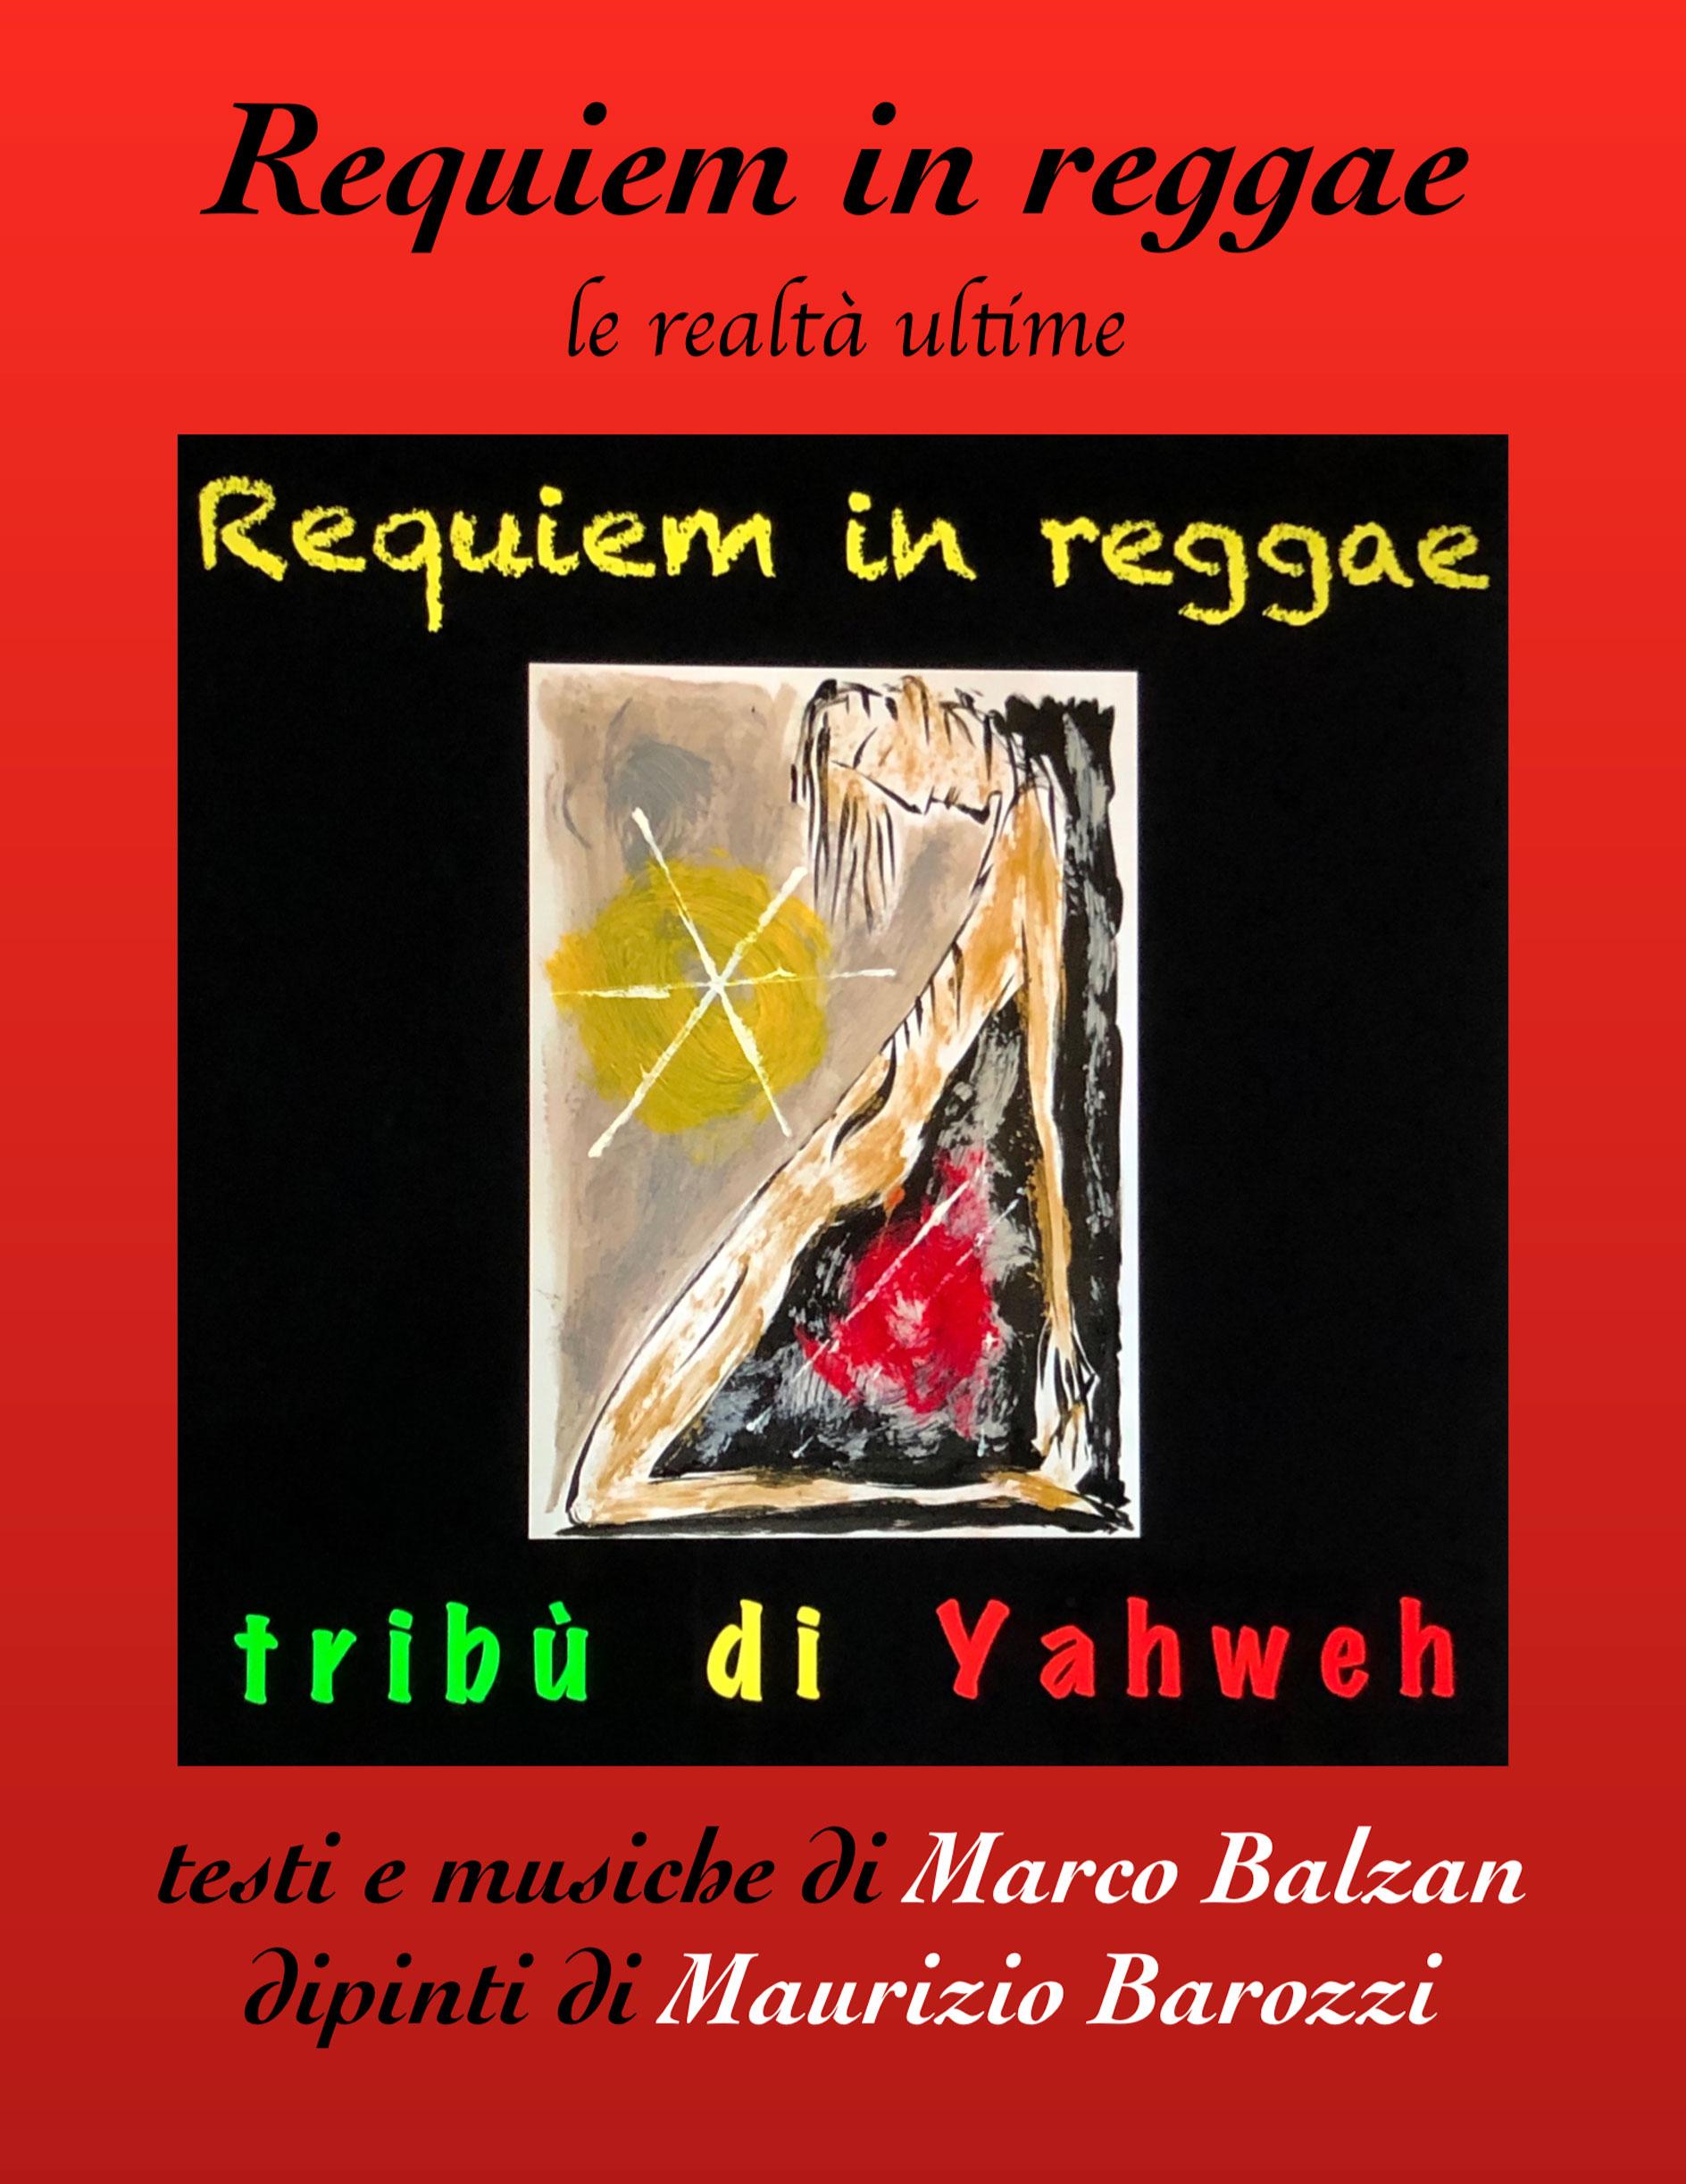 http://www.tribudiyahweh.com/wp/wp-content/uploads/2019/03/requiem-in-reggae.jpg